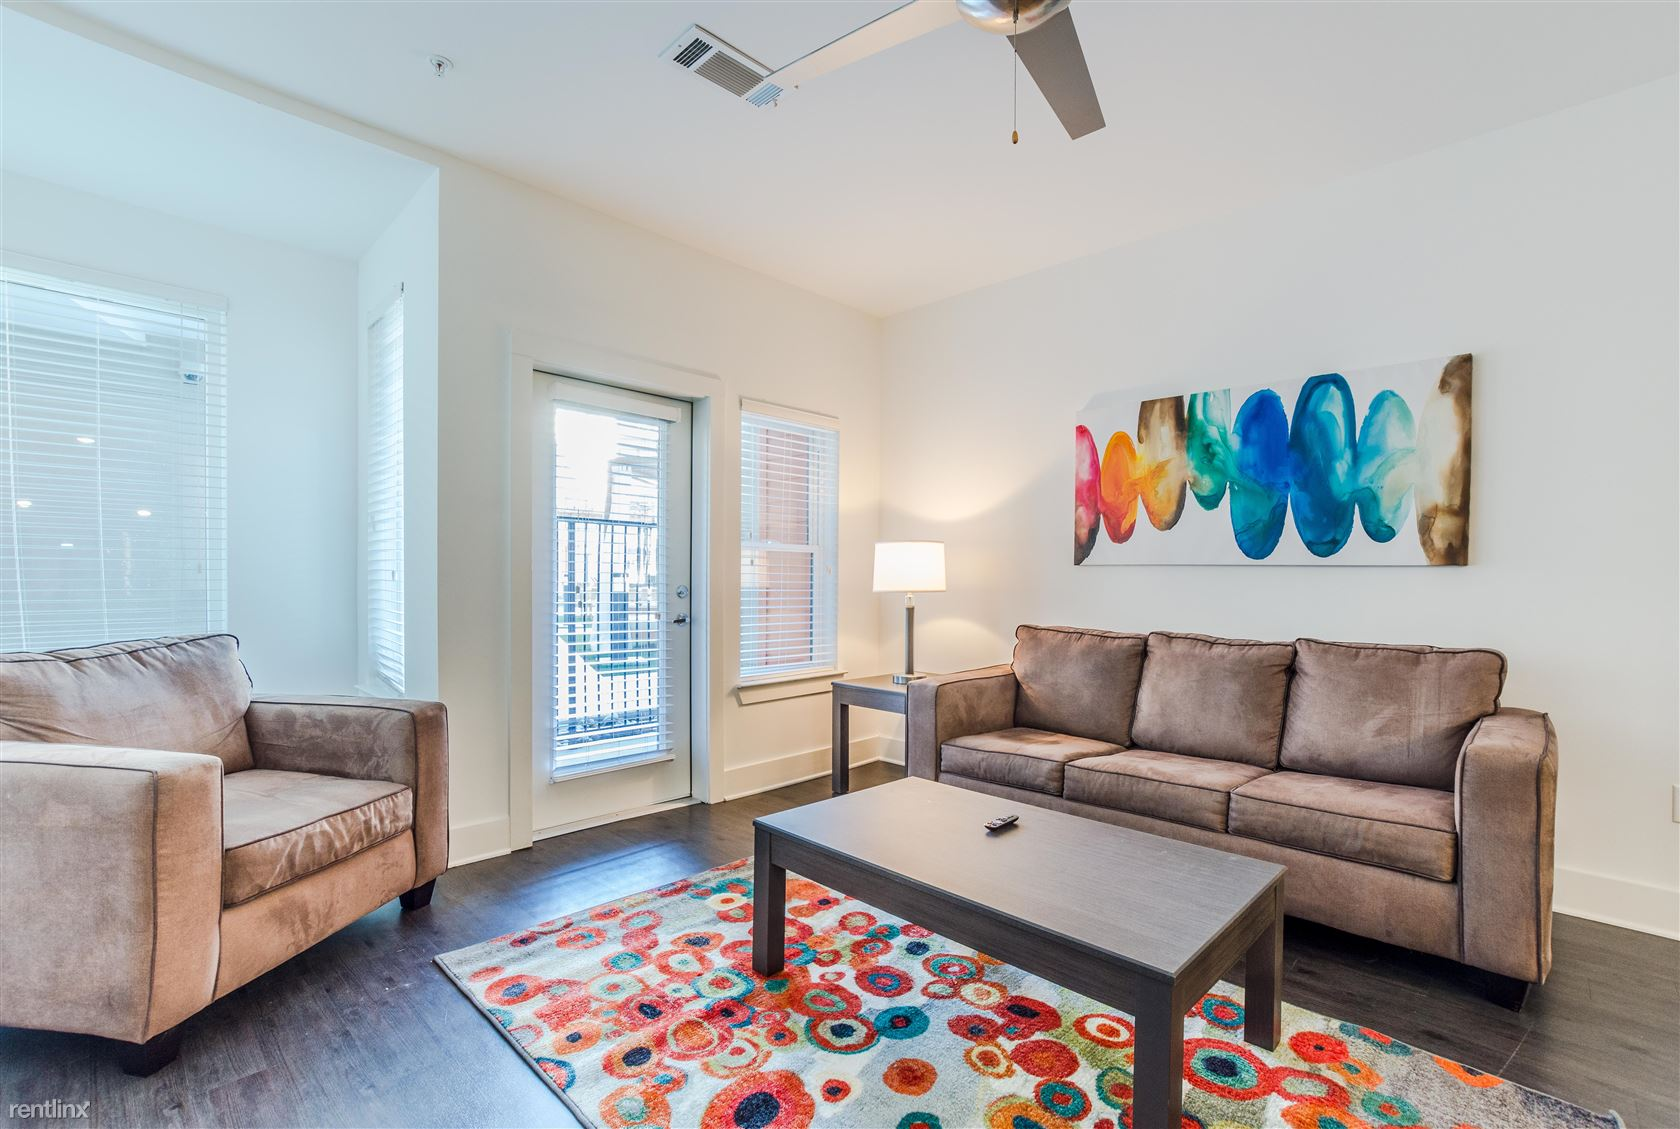 56 Gerrish Avenue, Chelsea, MA - $2,400